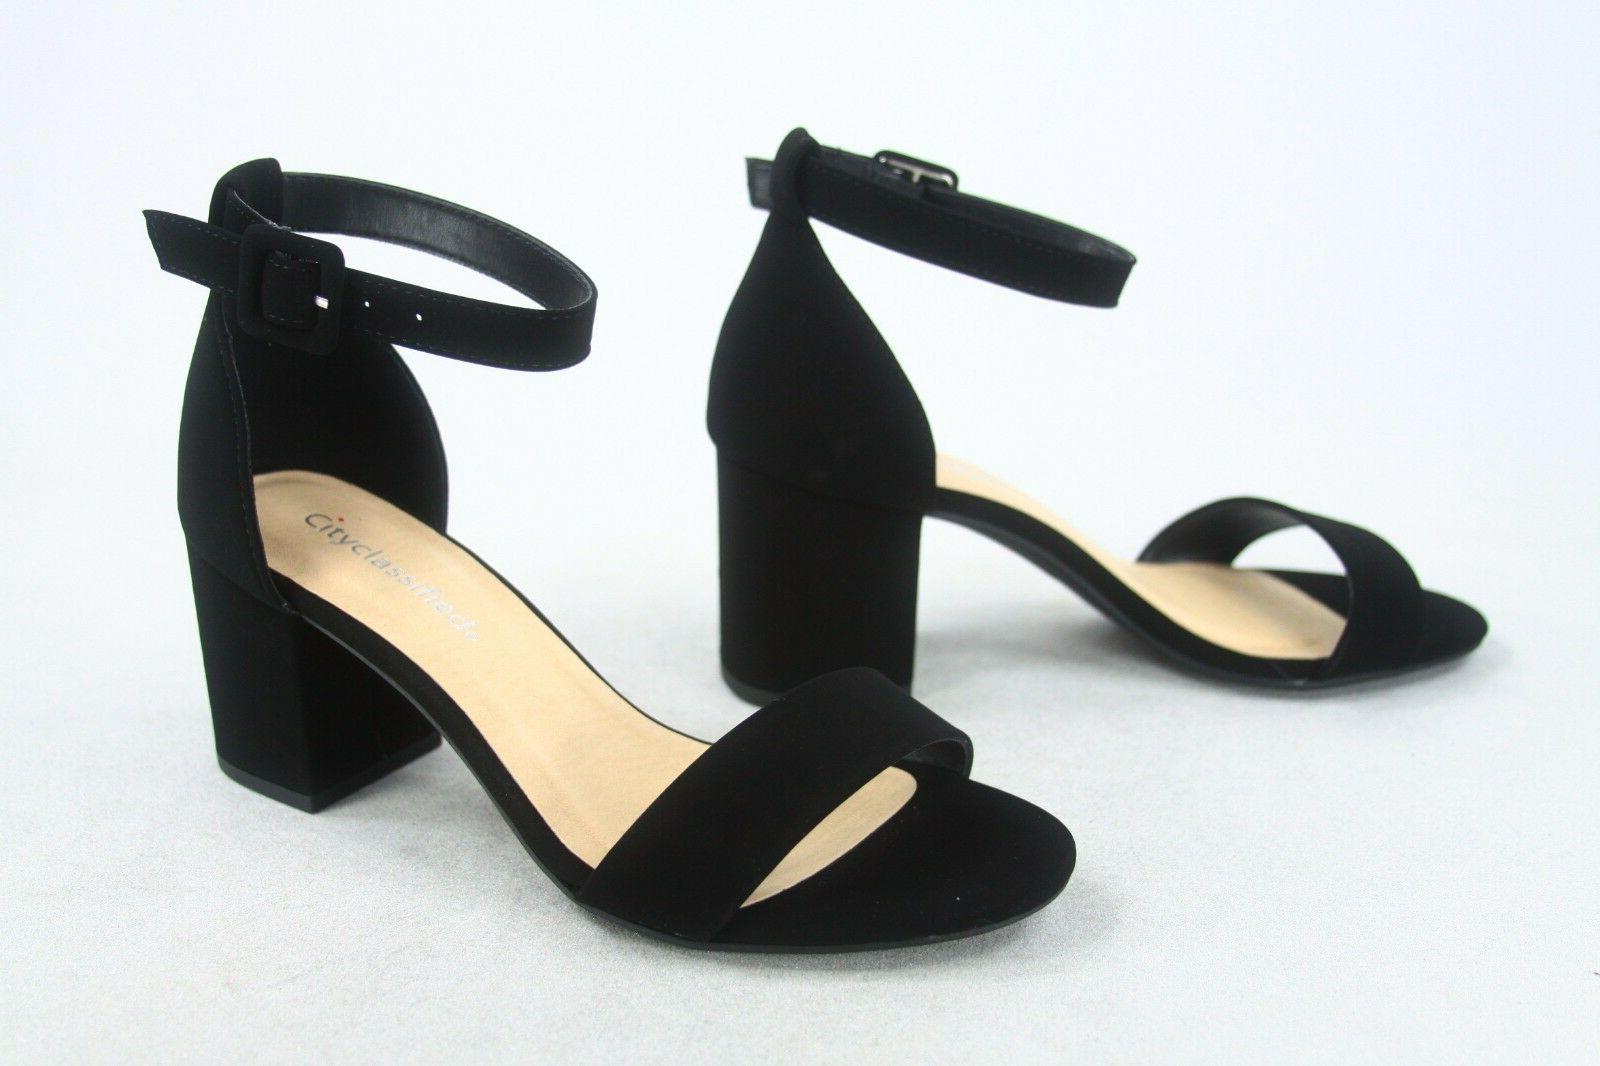 NEW Women's Color Strap Low Heel Dress Sandal Size 5 -